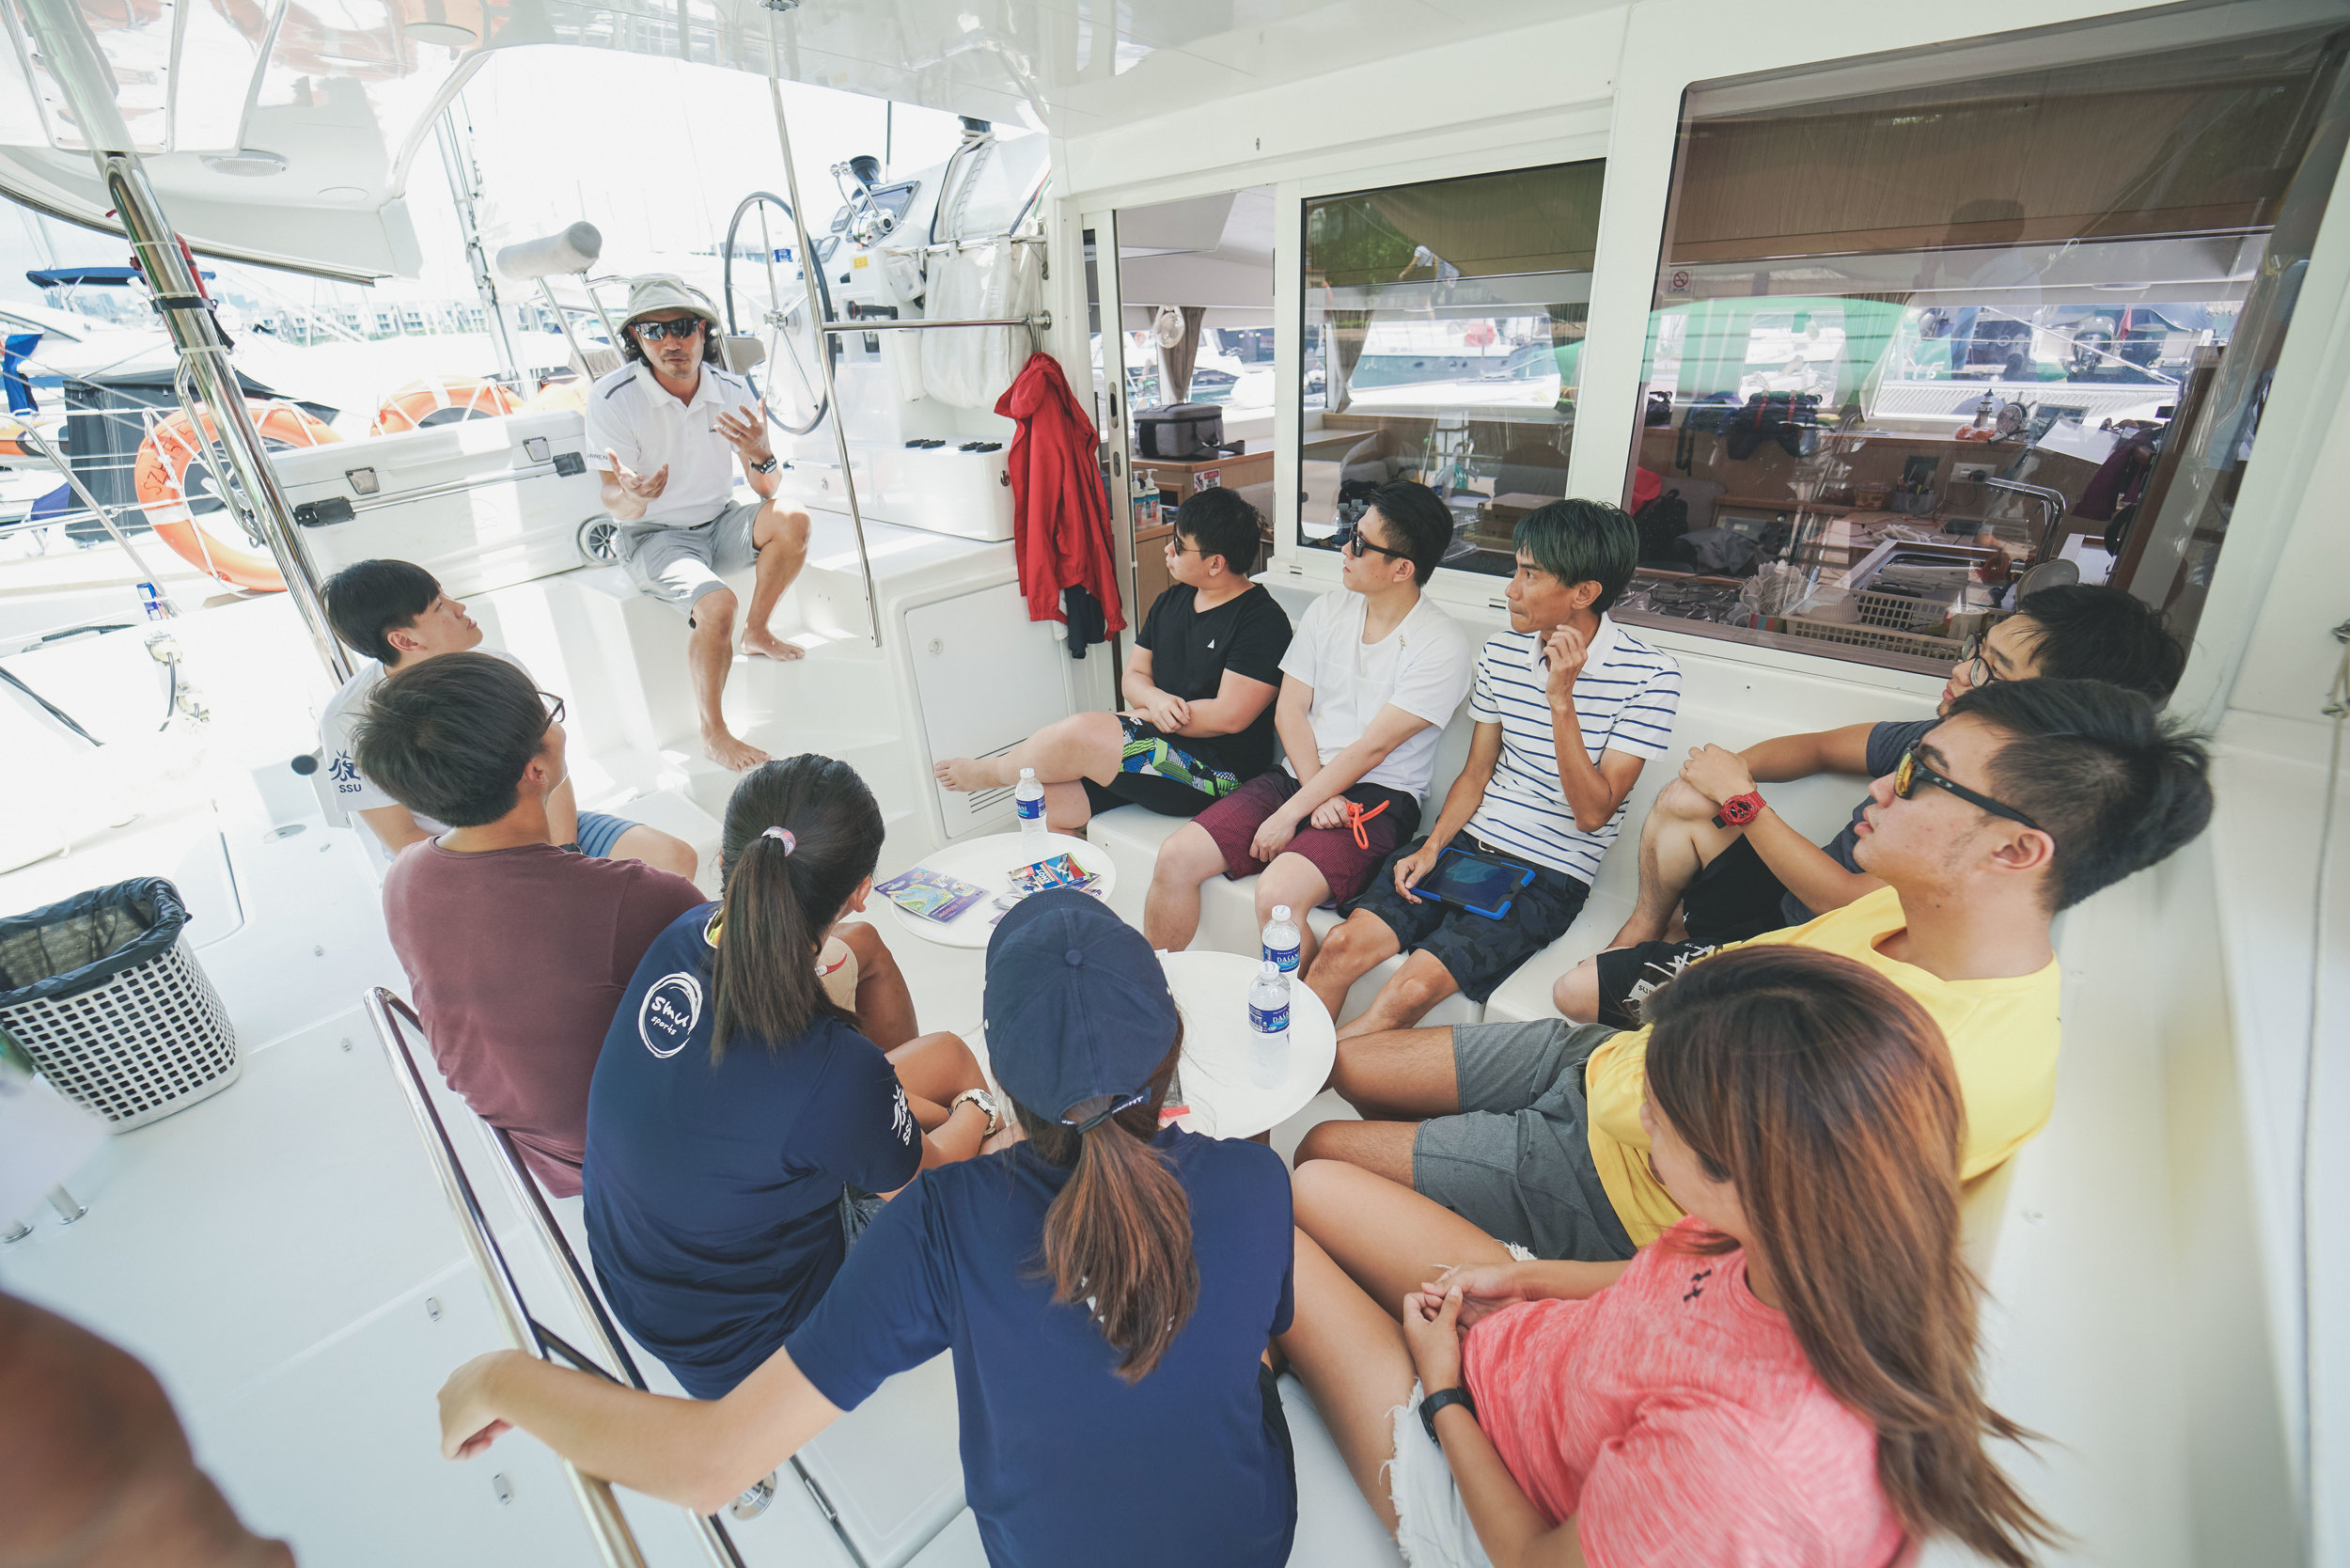 Ximula experiential sailing-1001.jpg